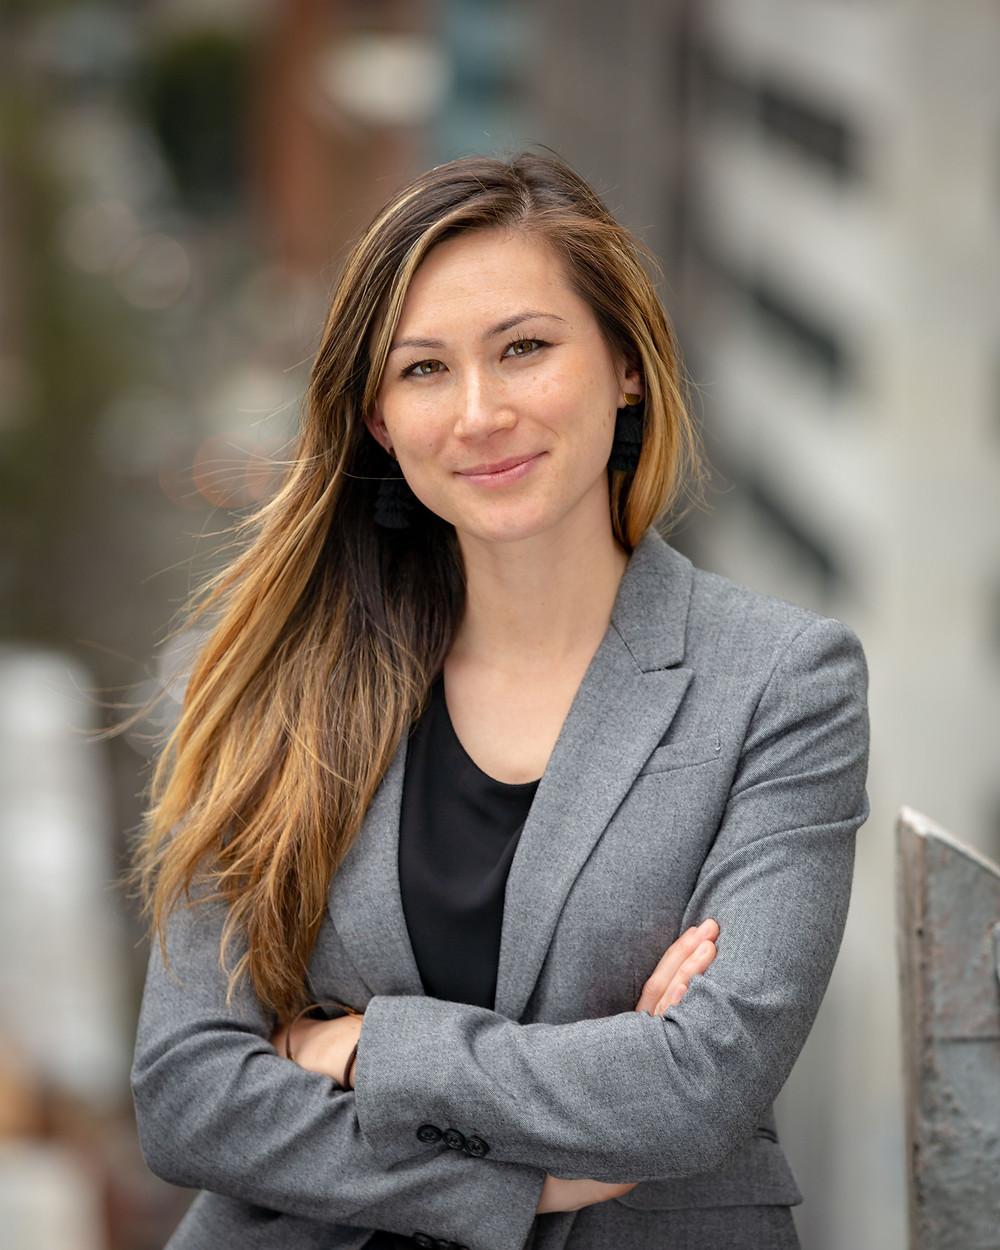 Professional headshot of Erica T. Johnson - Pathloom Advisor and Co-Founder of Modern Health